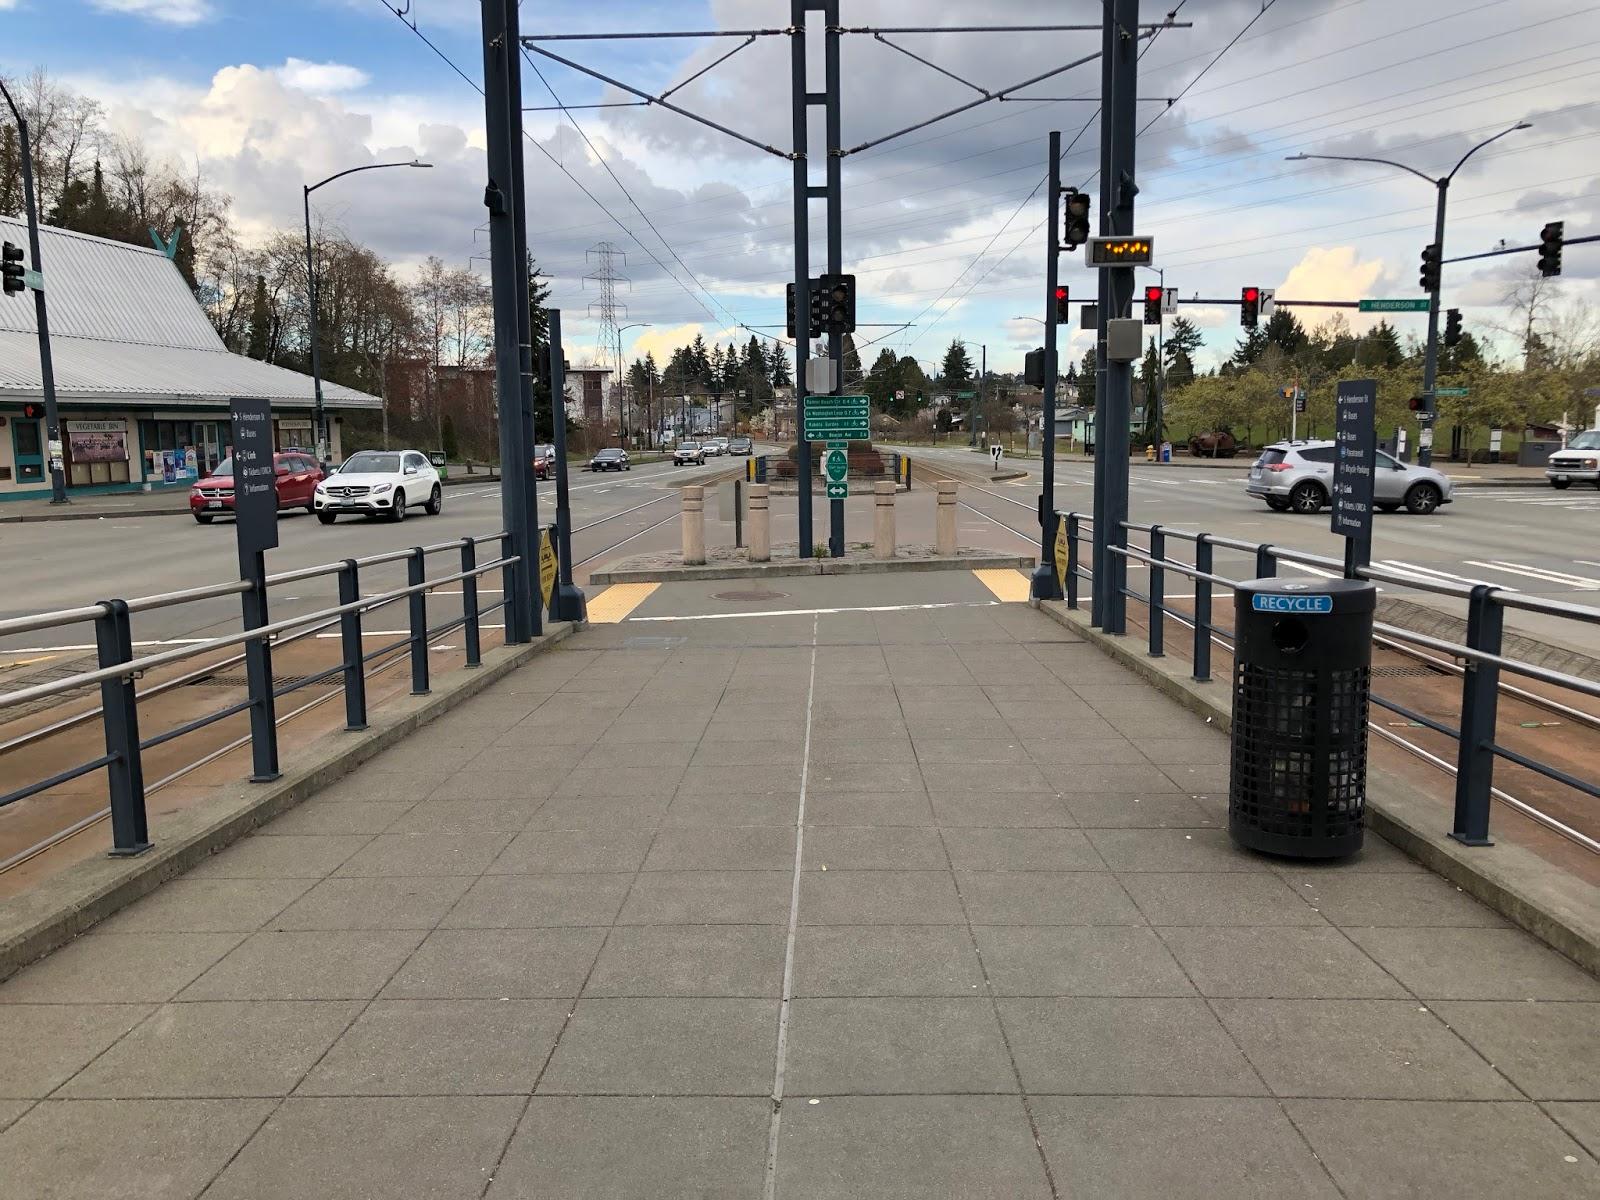 The South Fraser Blog: Seattle's light rail sheds light on